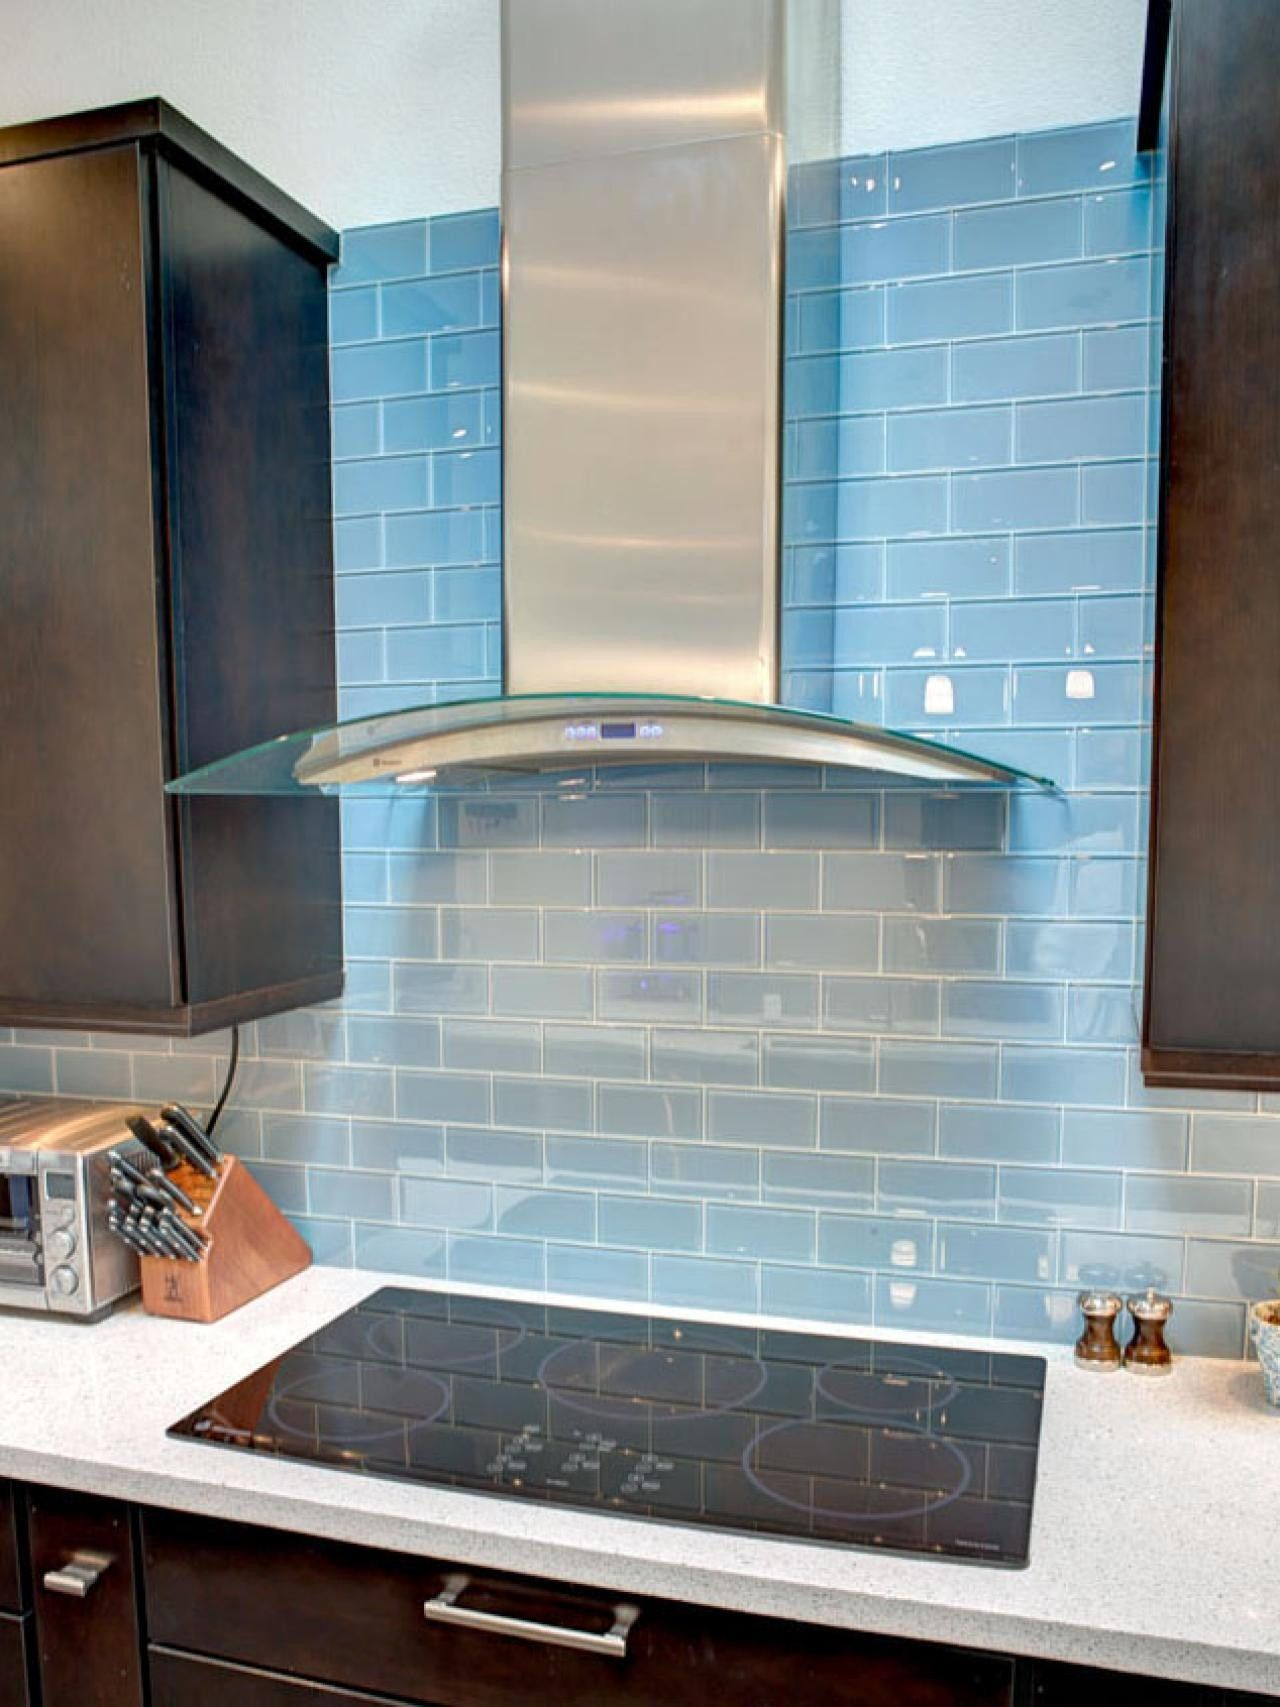 Tile Backsplash Behind Range Hood Kitchen Idea Kitchen